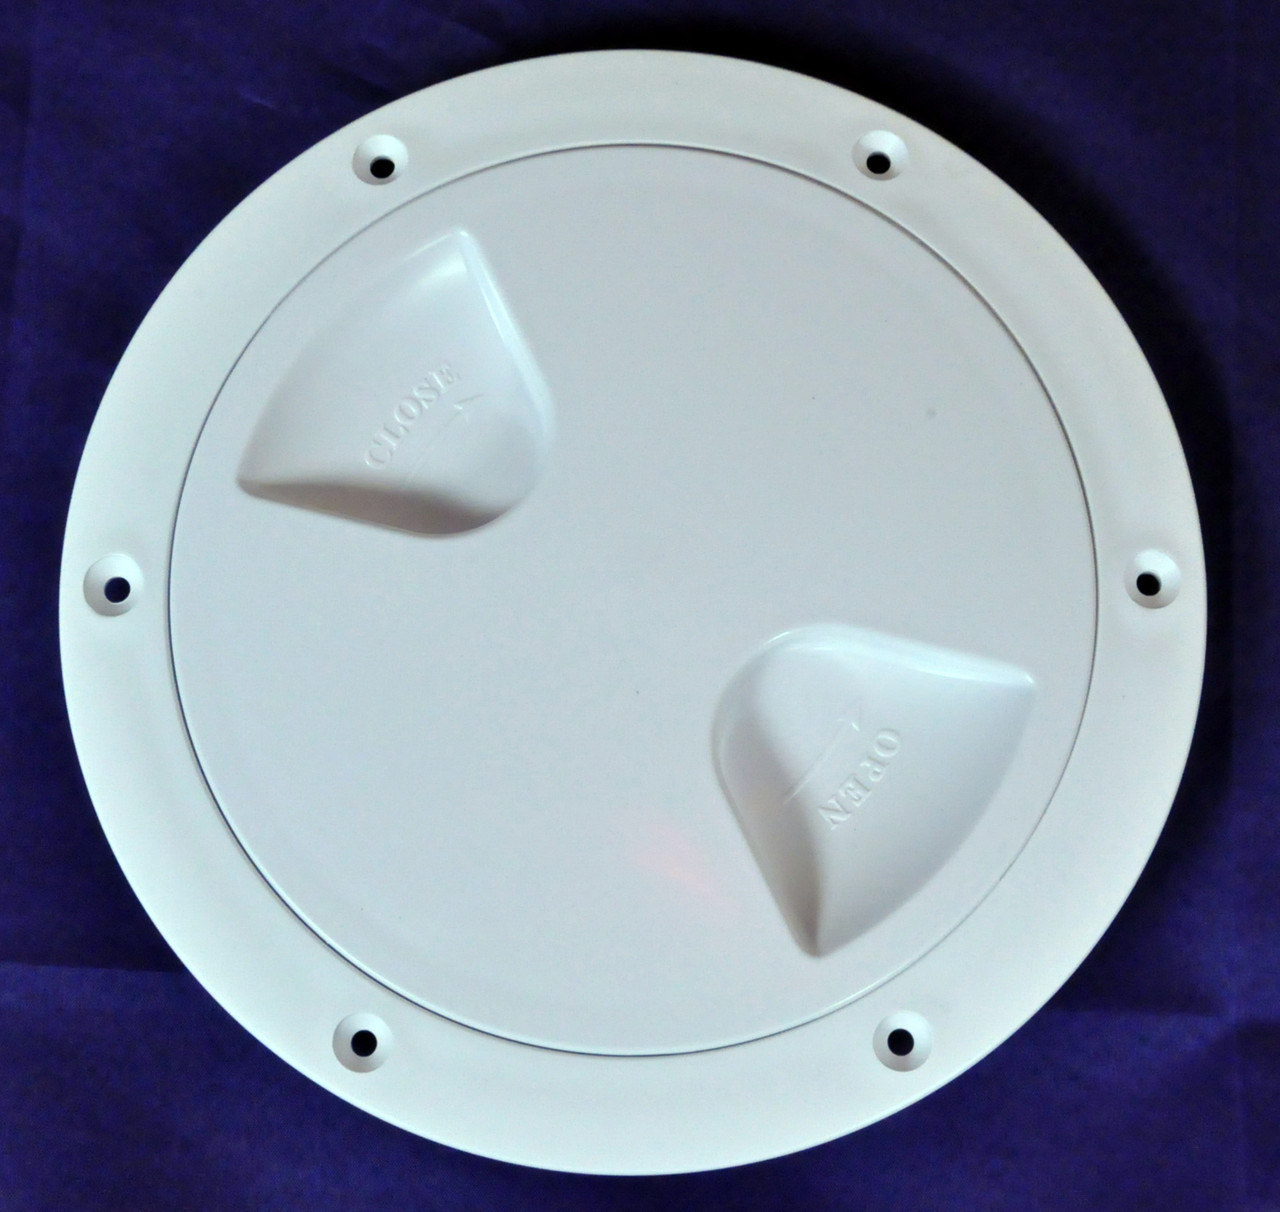 Лючок инспекция 102 мм белый, Тайвань 13560-WH